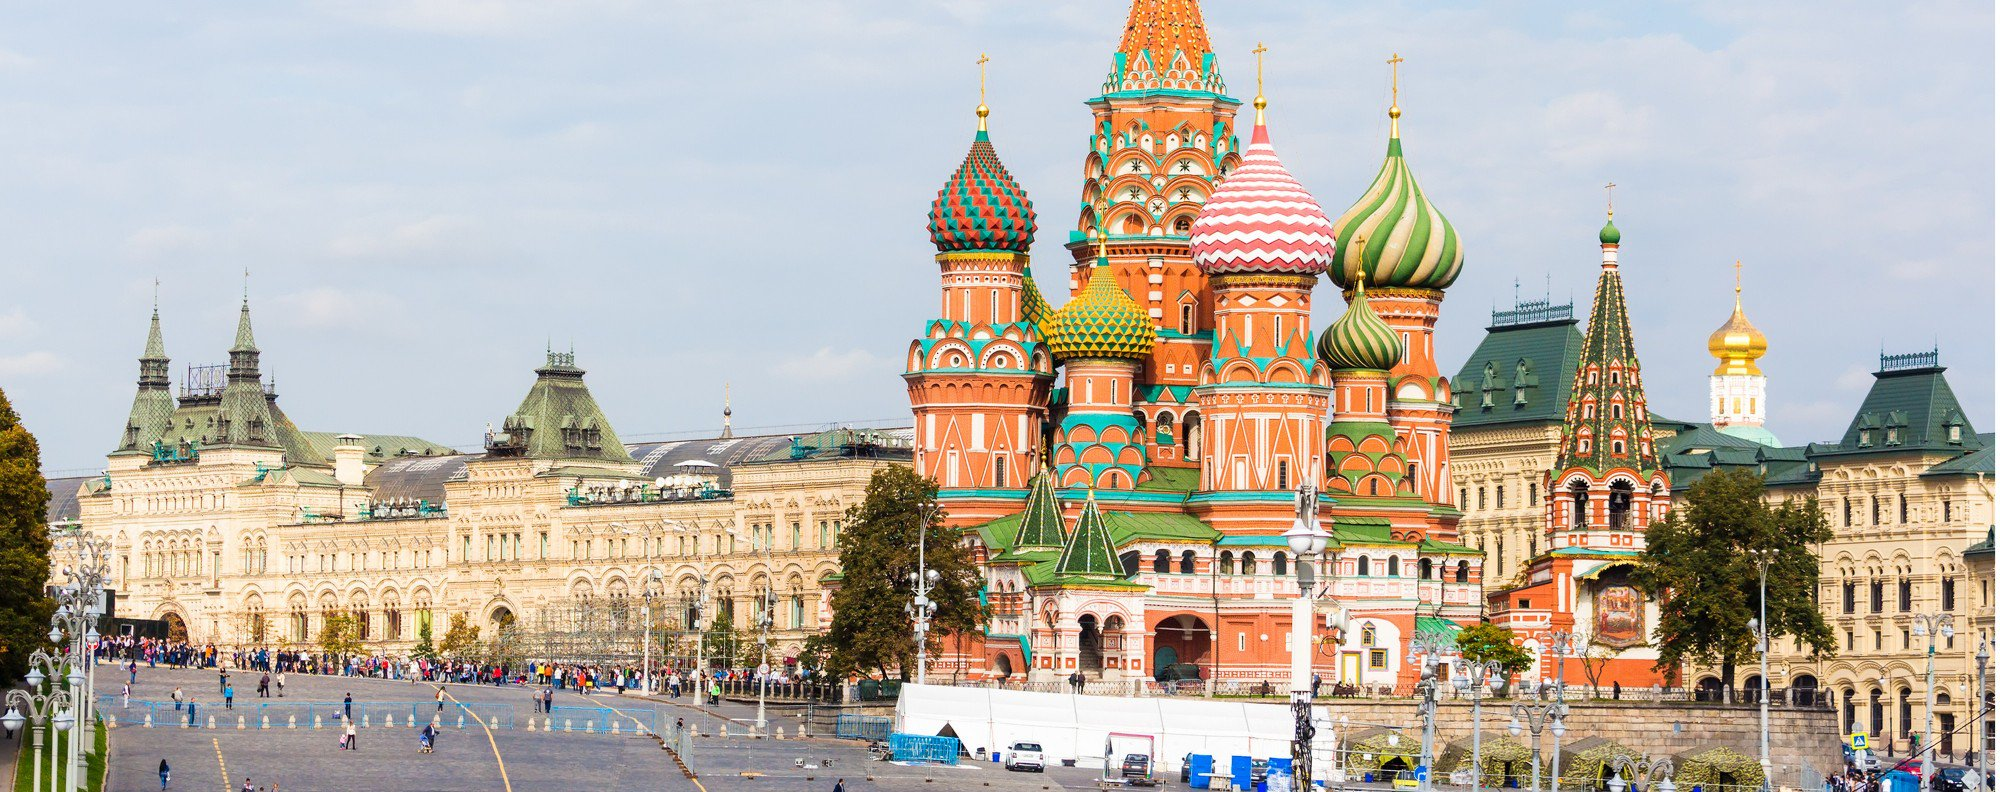 Moscow_panorama.jpg